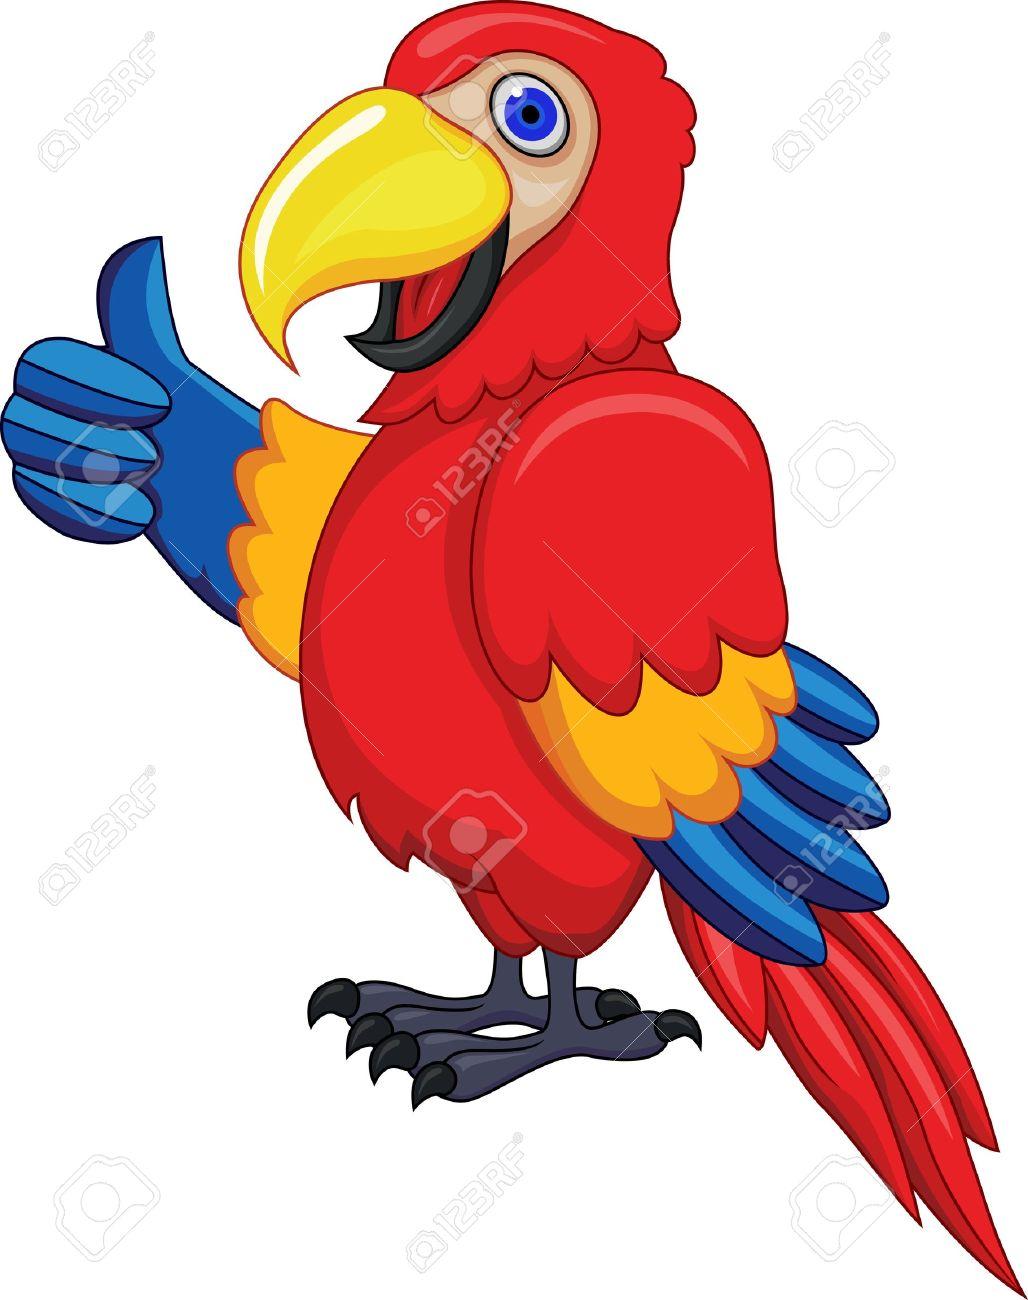 Parrot Cartoon Pictures Parrot Cartoon Funny Parrot